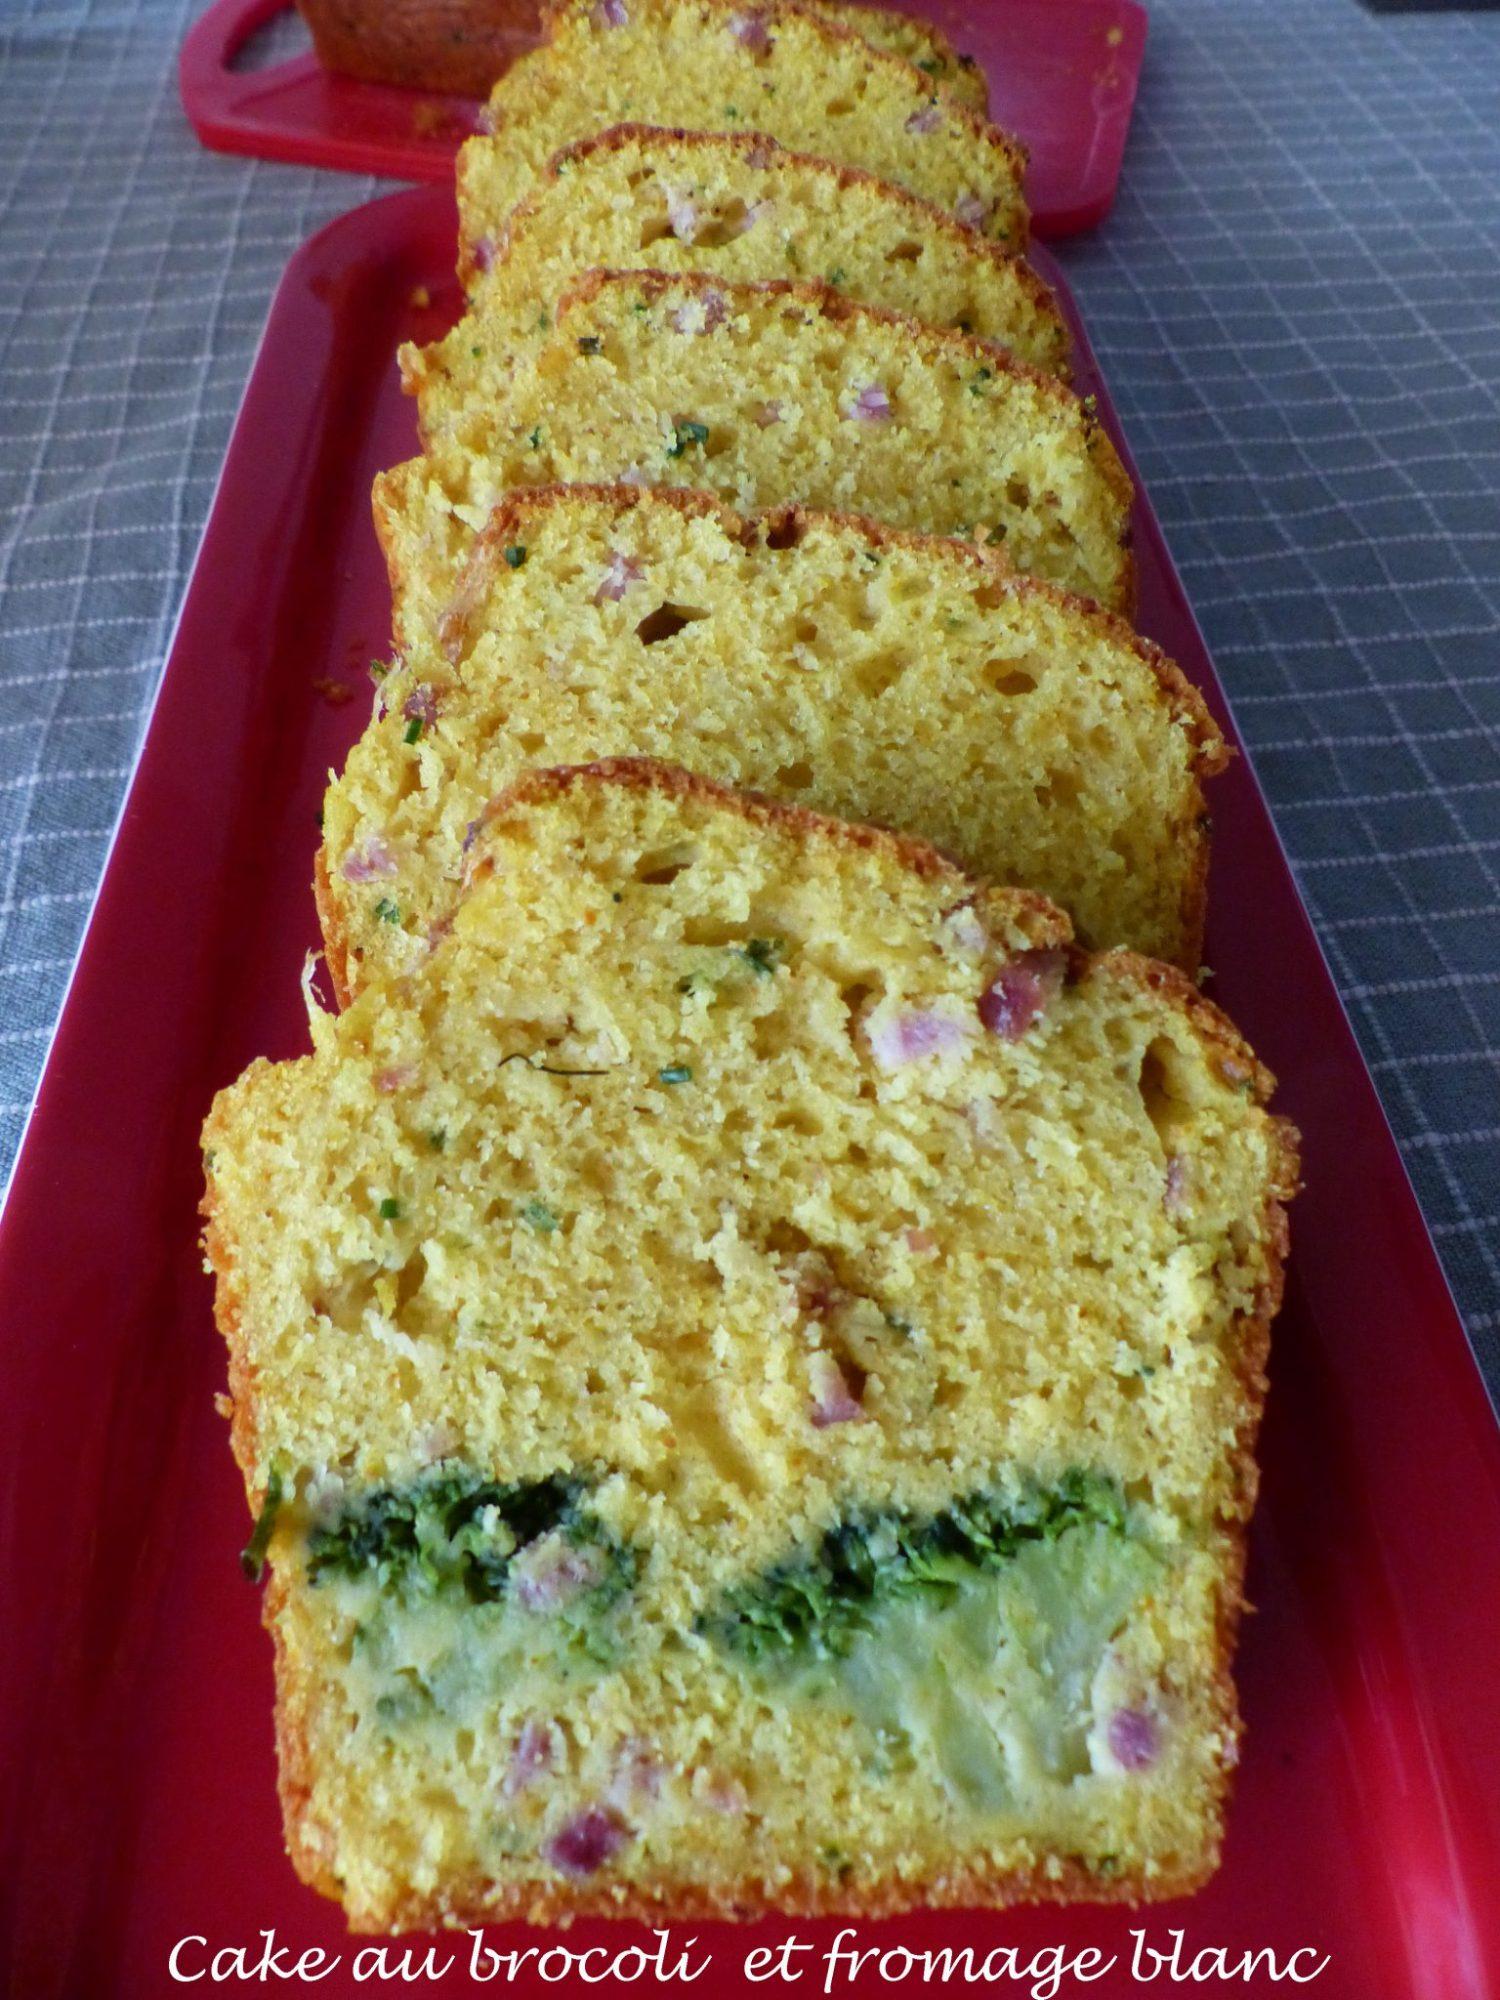 Cake au brocoli et fromage blanc P1120824 R